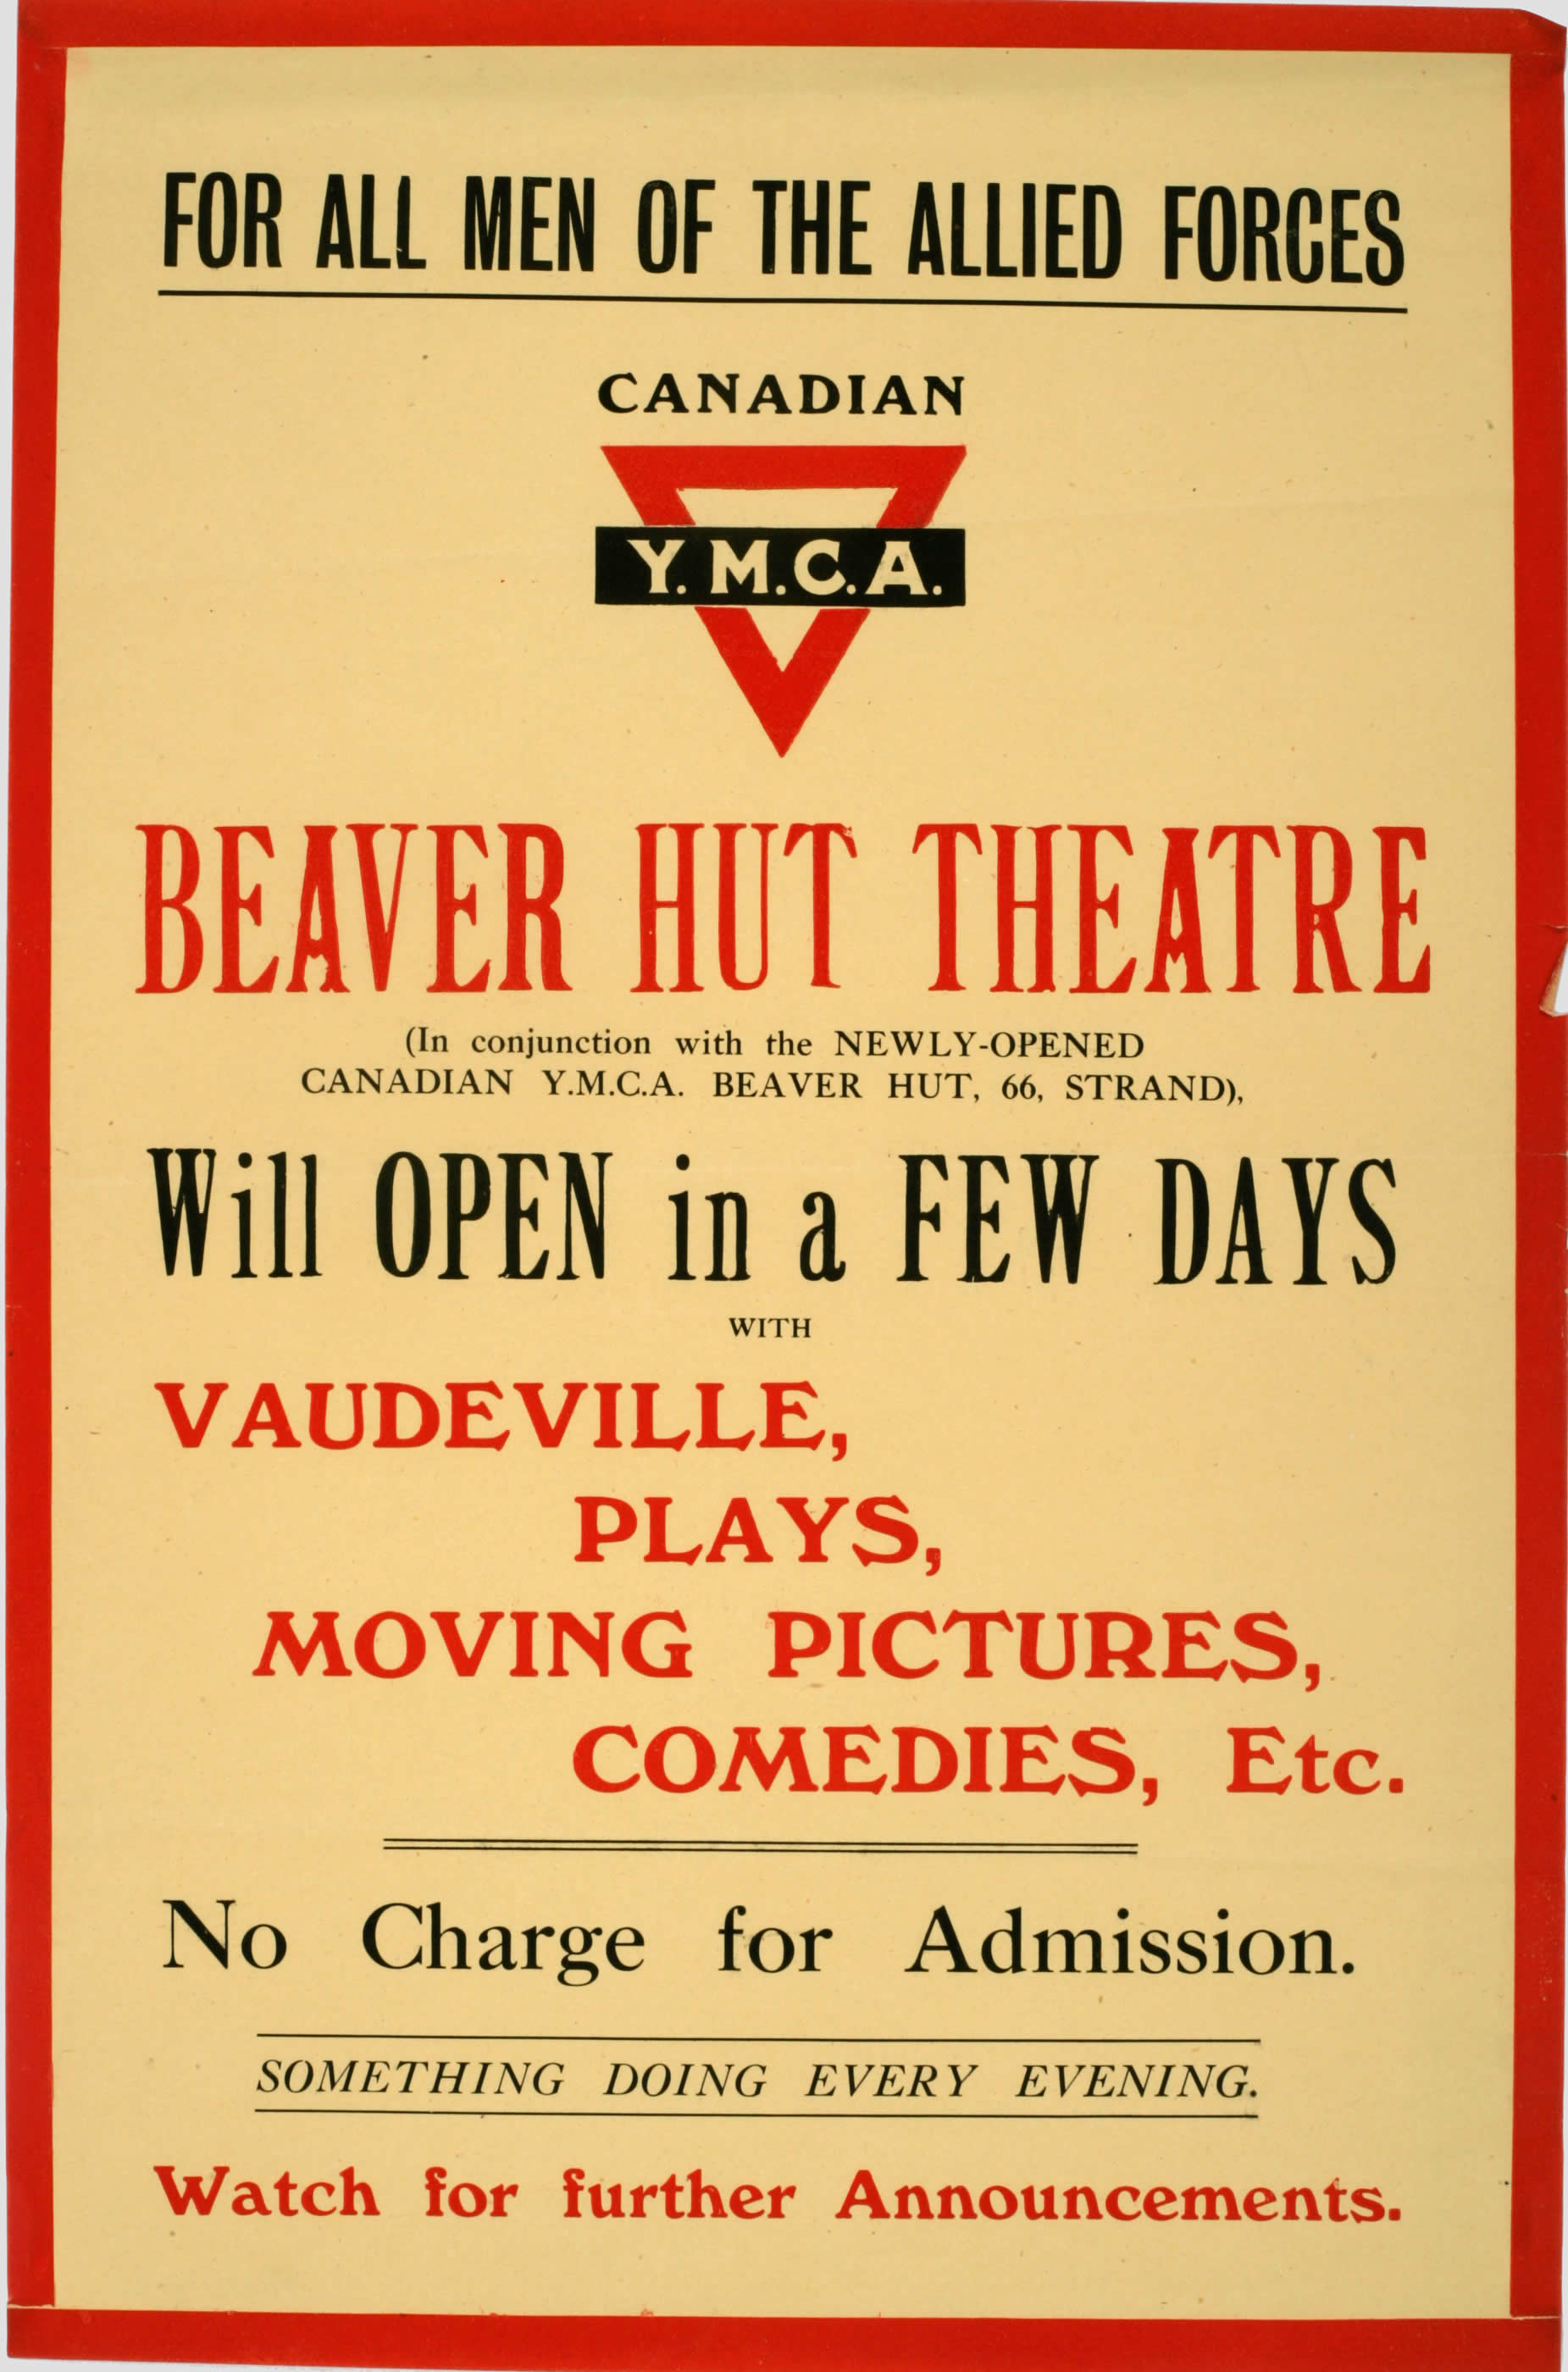 Beaver Hut Theatre